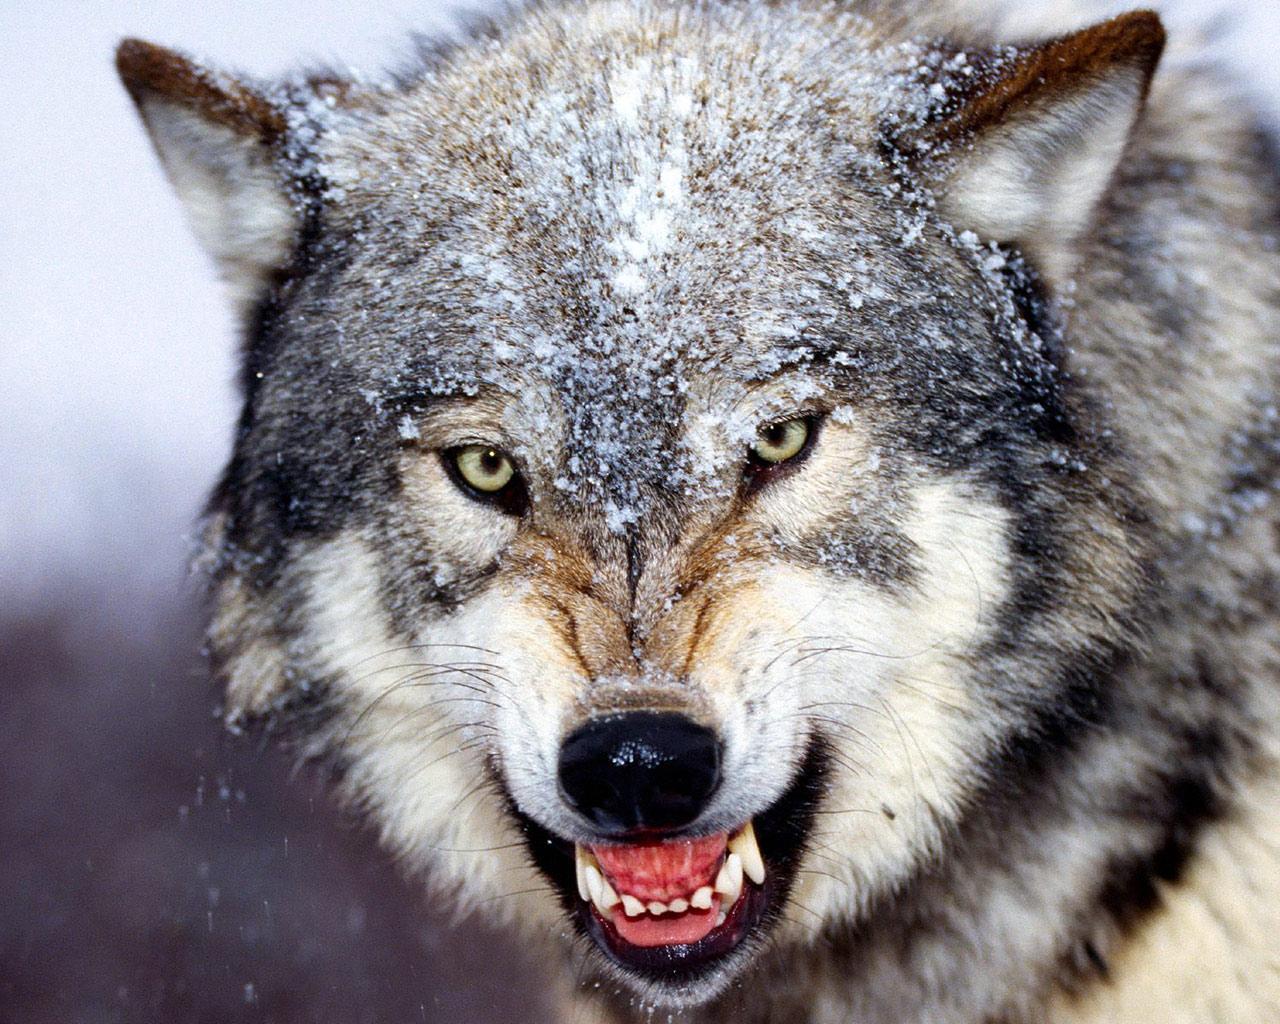 http://4.bp.blogspot.com/_bQ0SqifjNcg/SwJG-jRJ02I/AAAAAAAAIK4/fvZrLBfpC30/s1600/wolf-wallpaper-4.jpg